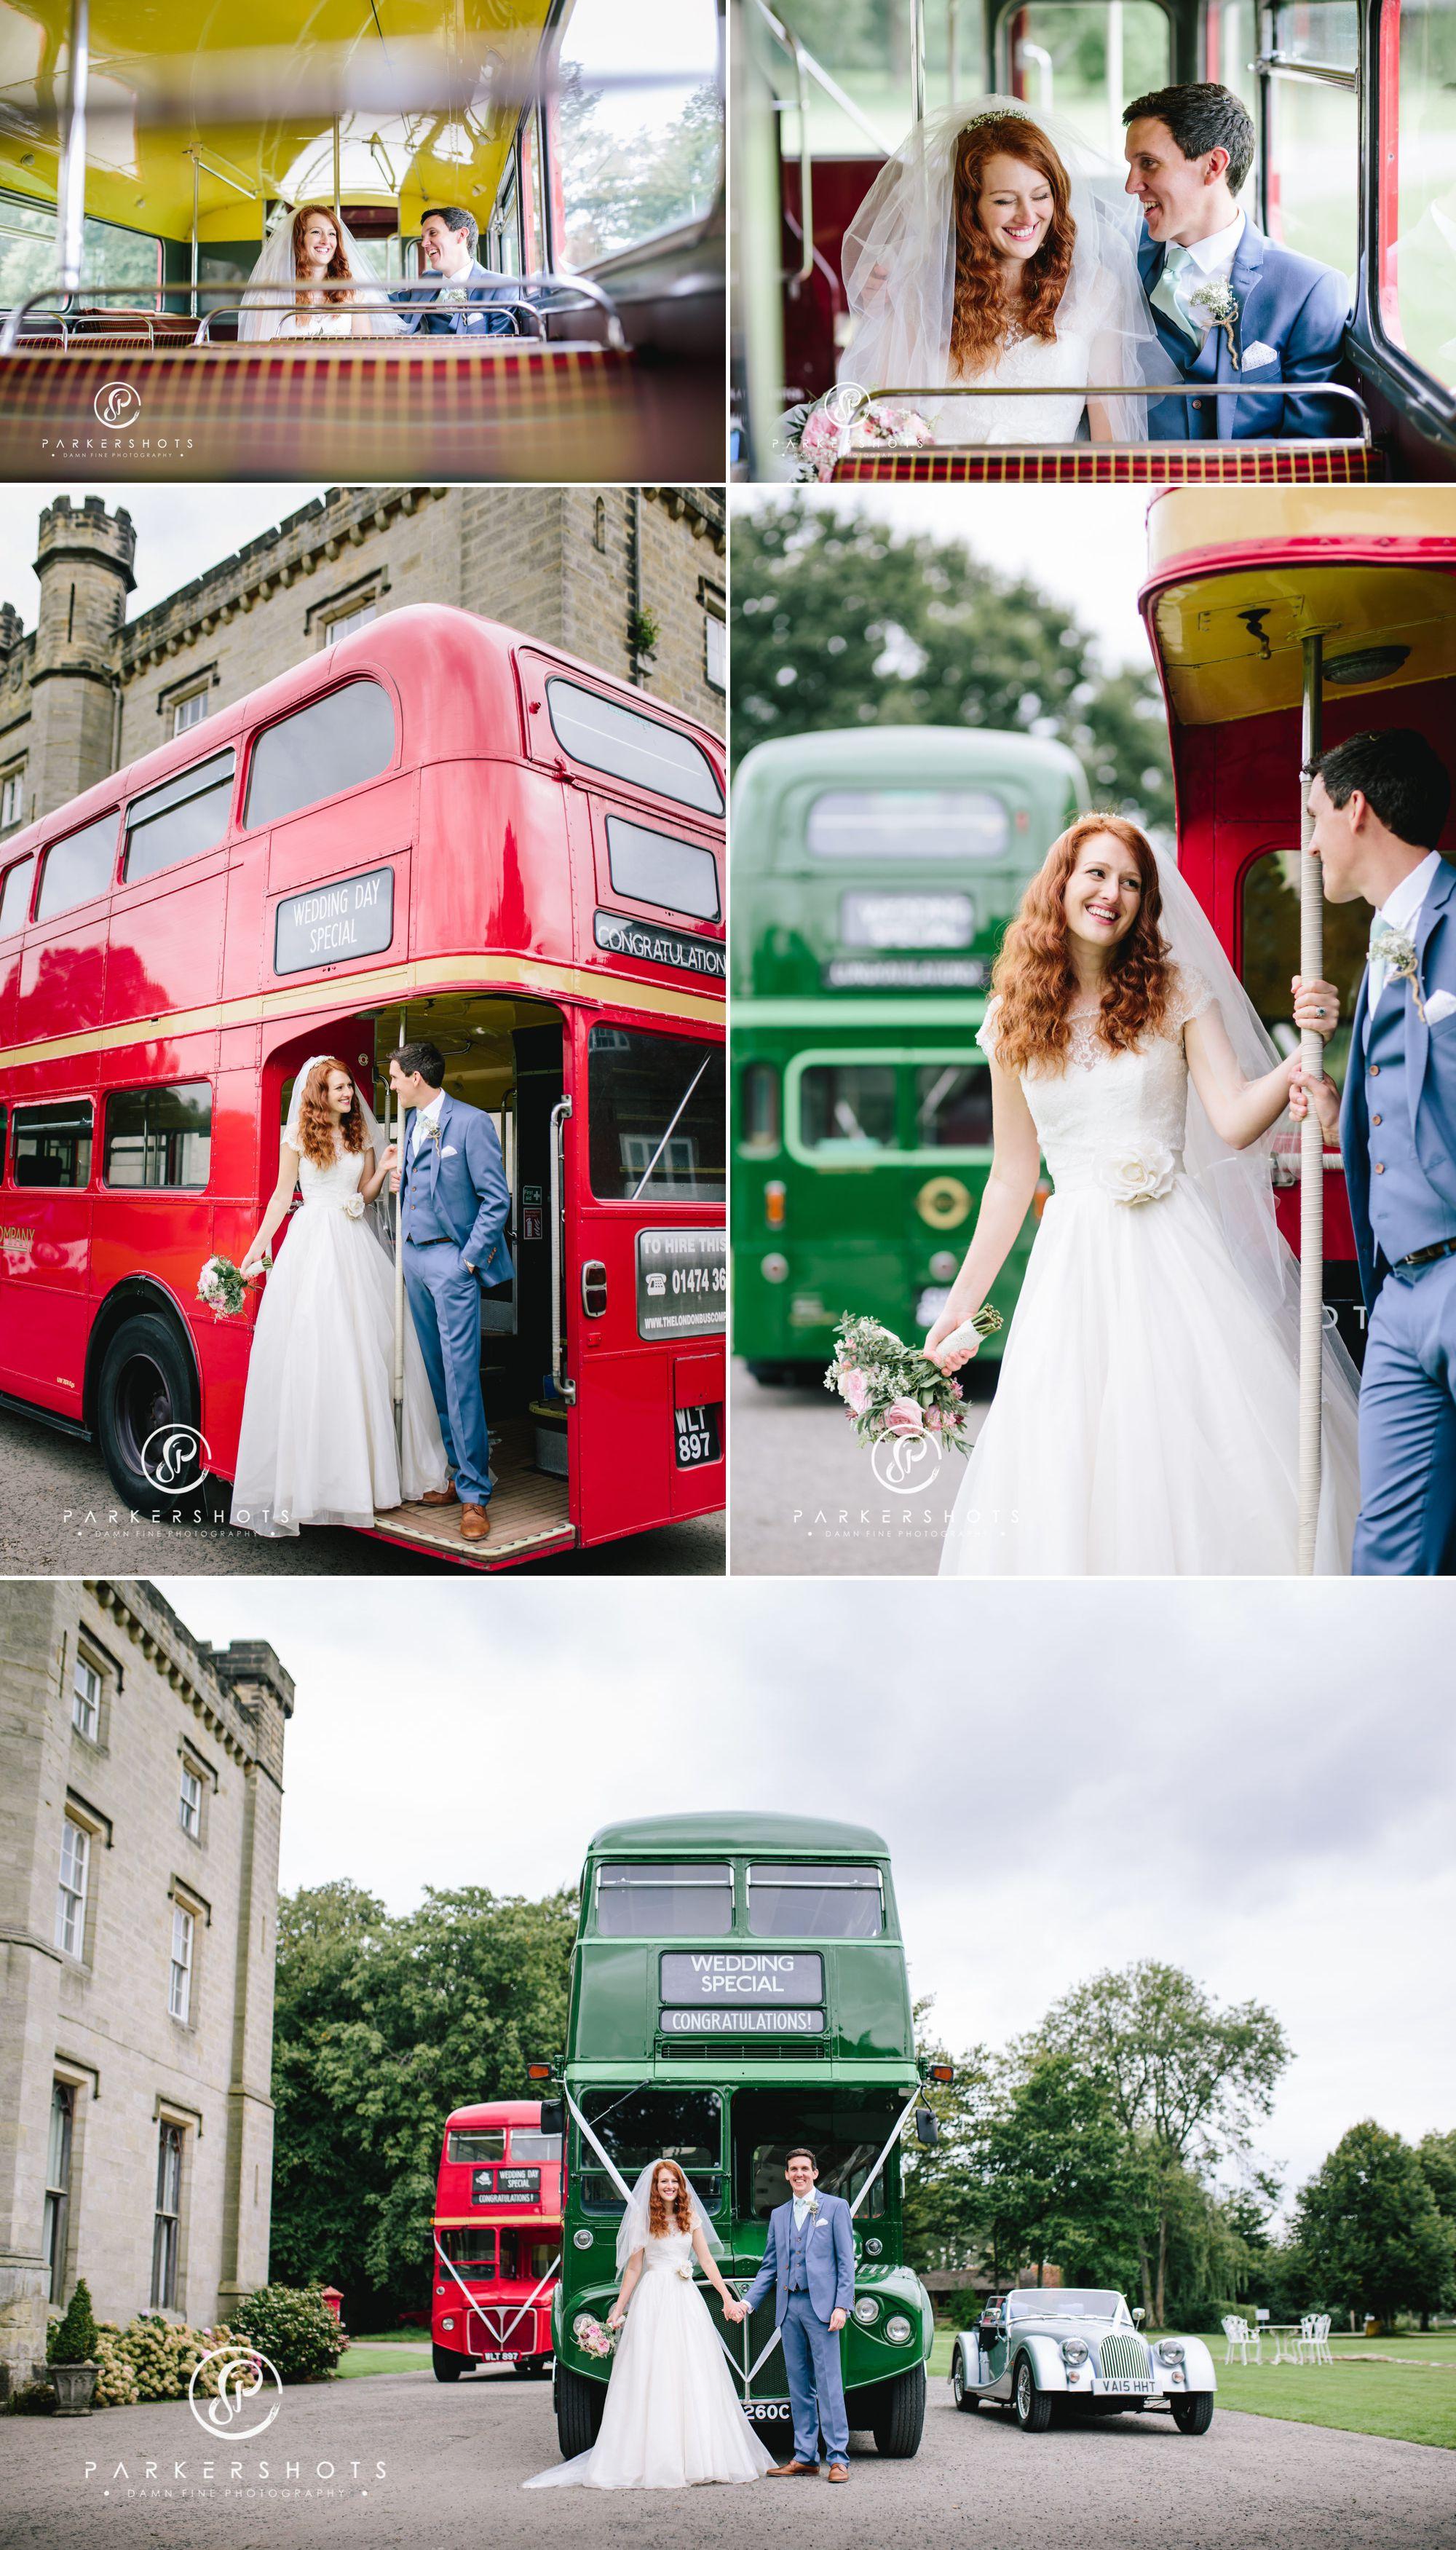 Chiddingstone_Castle_Wedding_Photographer 14